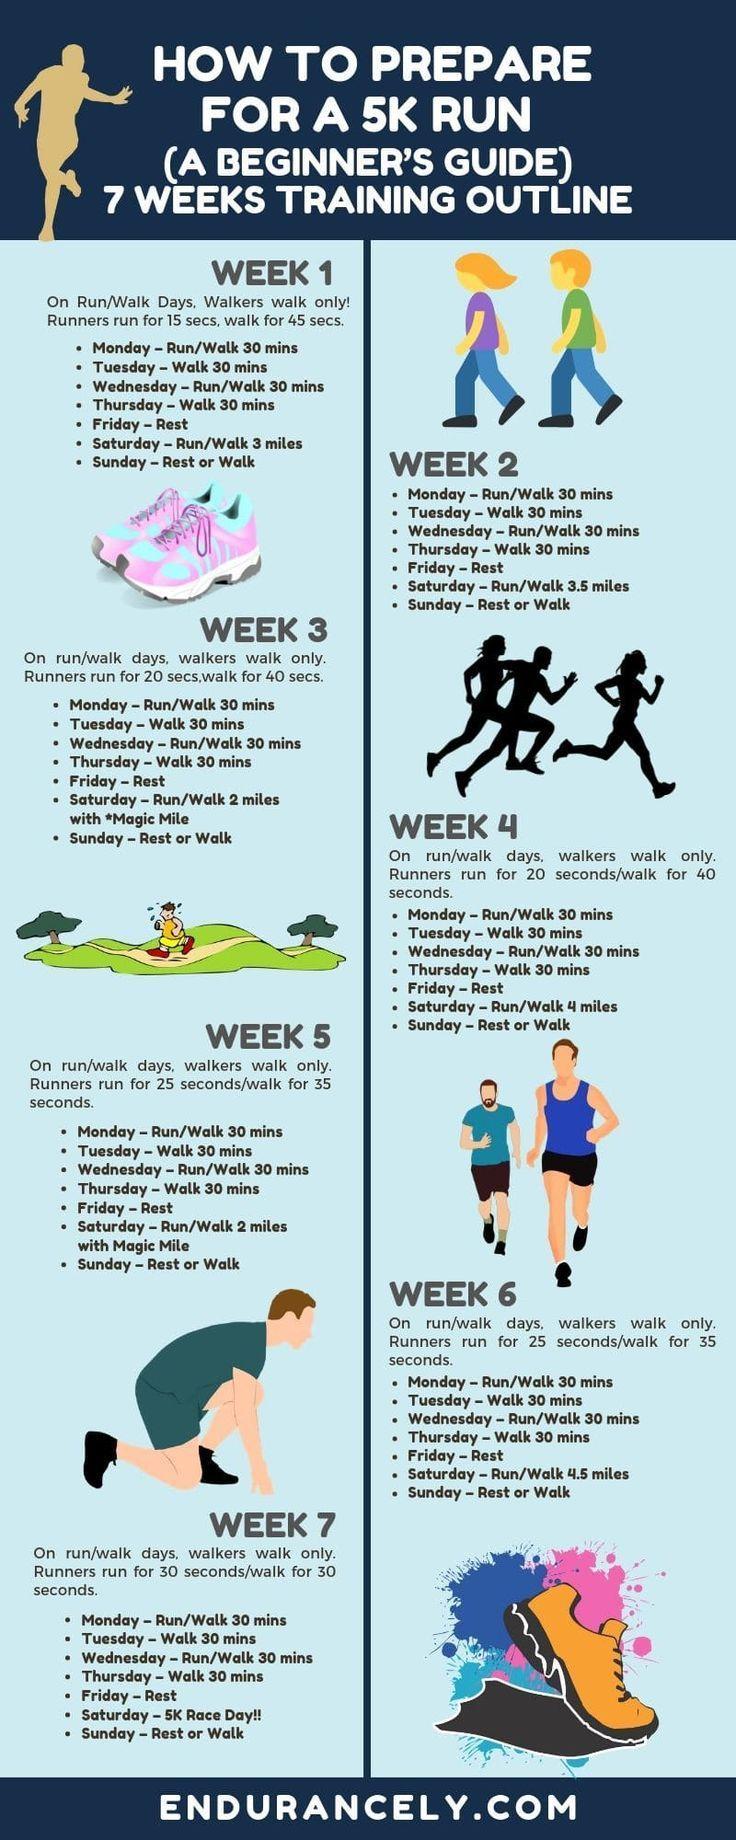 6f50c934f79d580c02a189430bc02aea - How To Get A Permit For A 5k Race